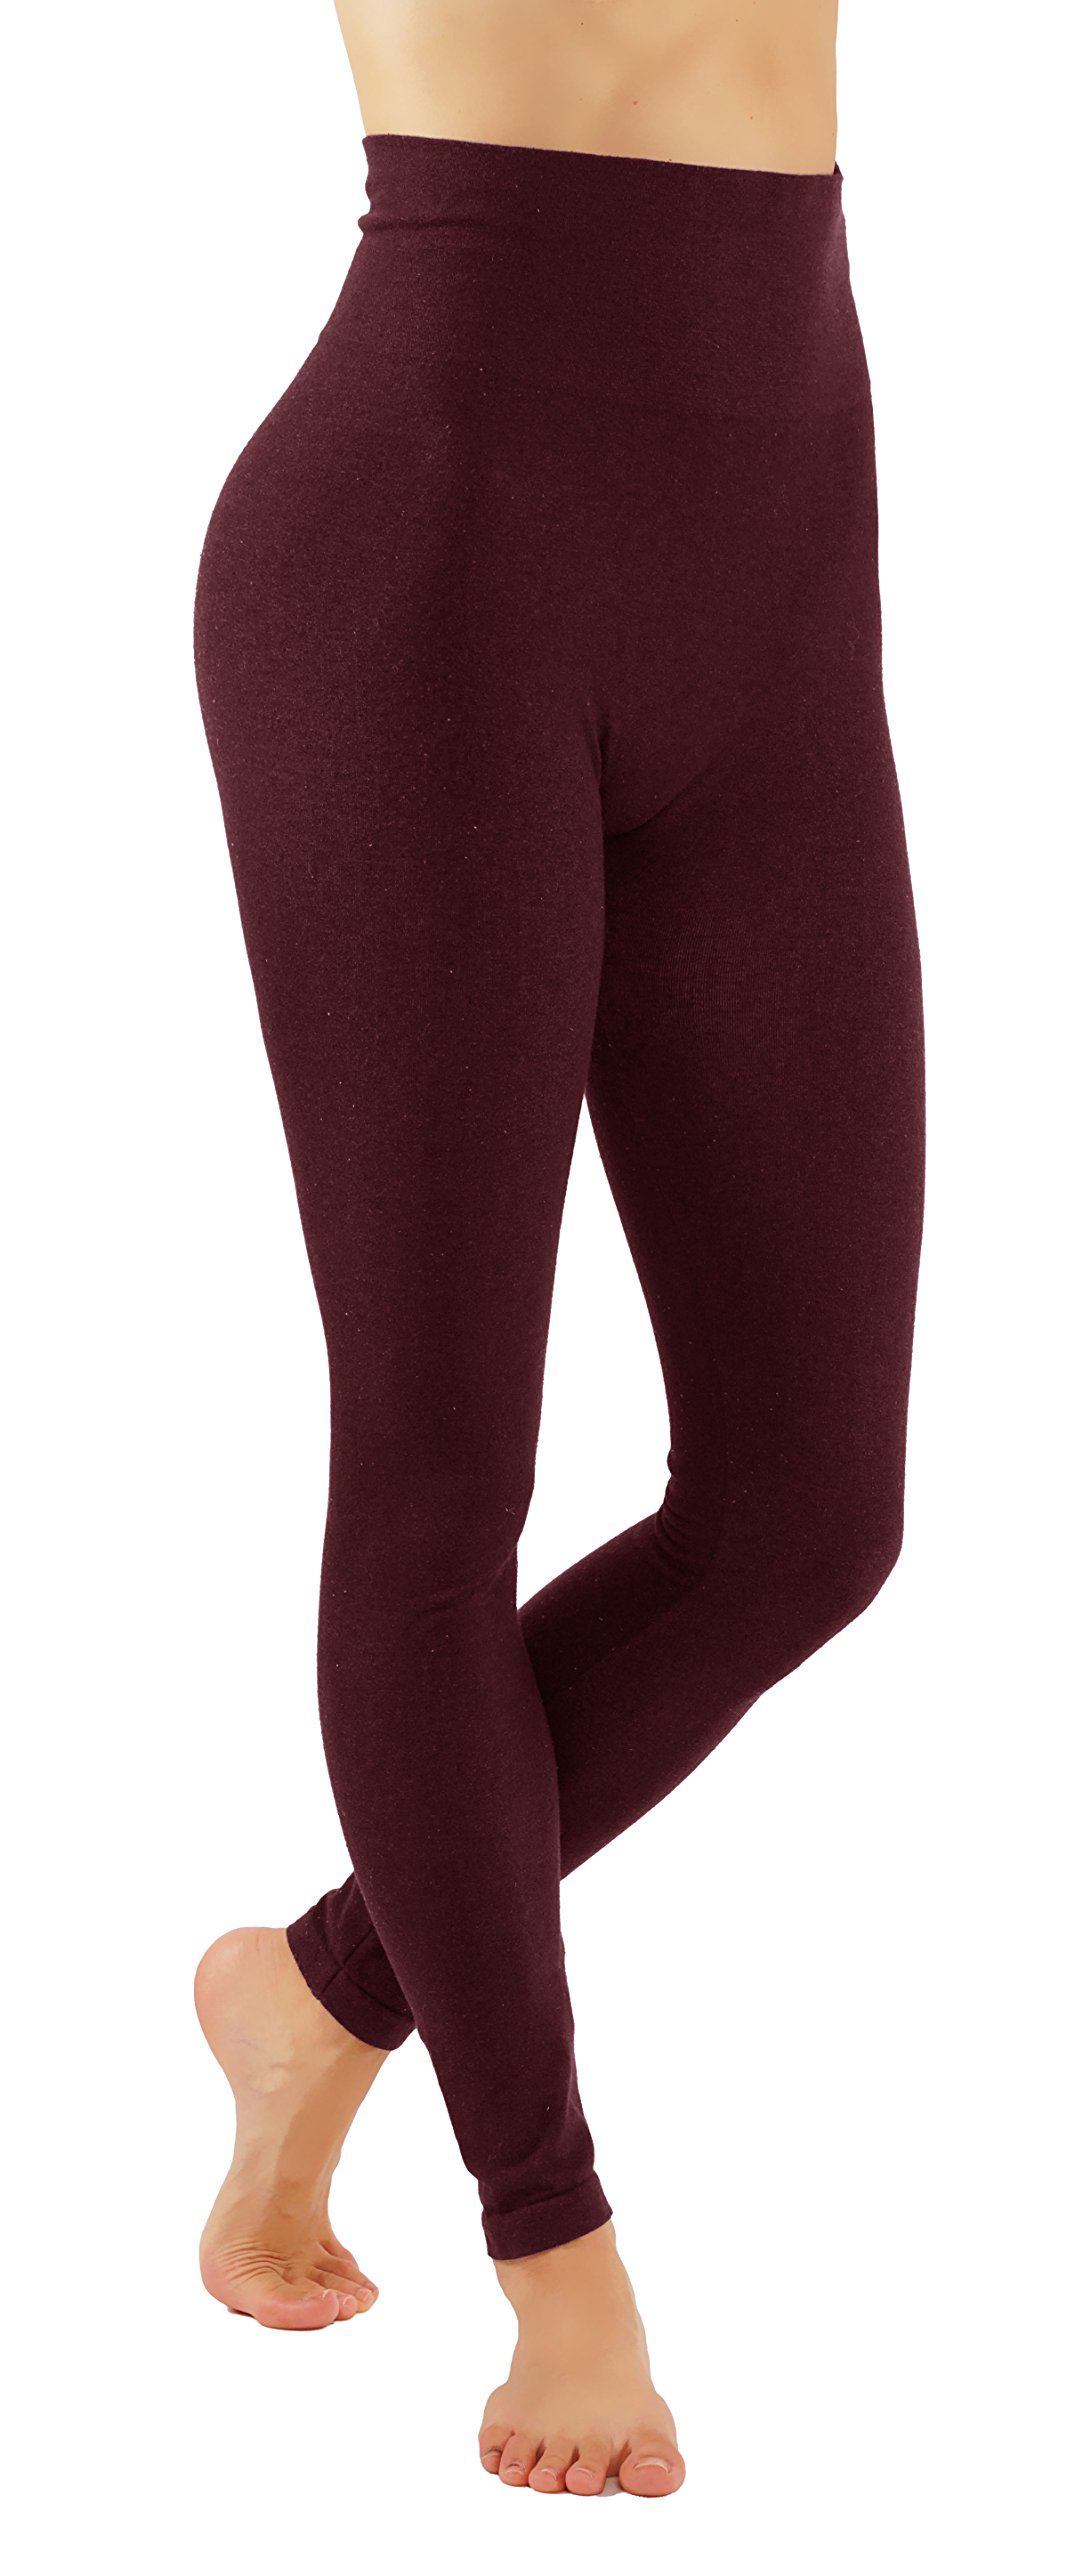 Pro Fit Women's High Waist Cotton Yoga Pants Workout Leggings (L/X-L Burgundy-lhw010)